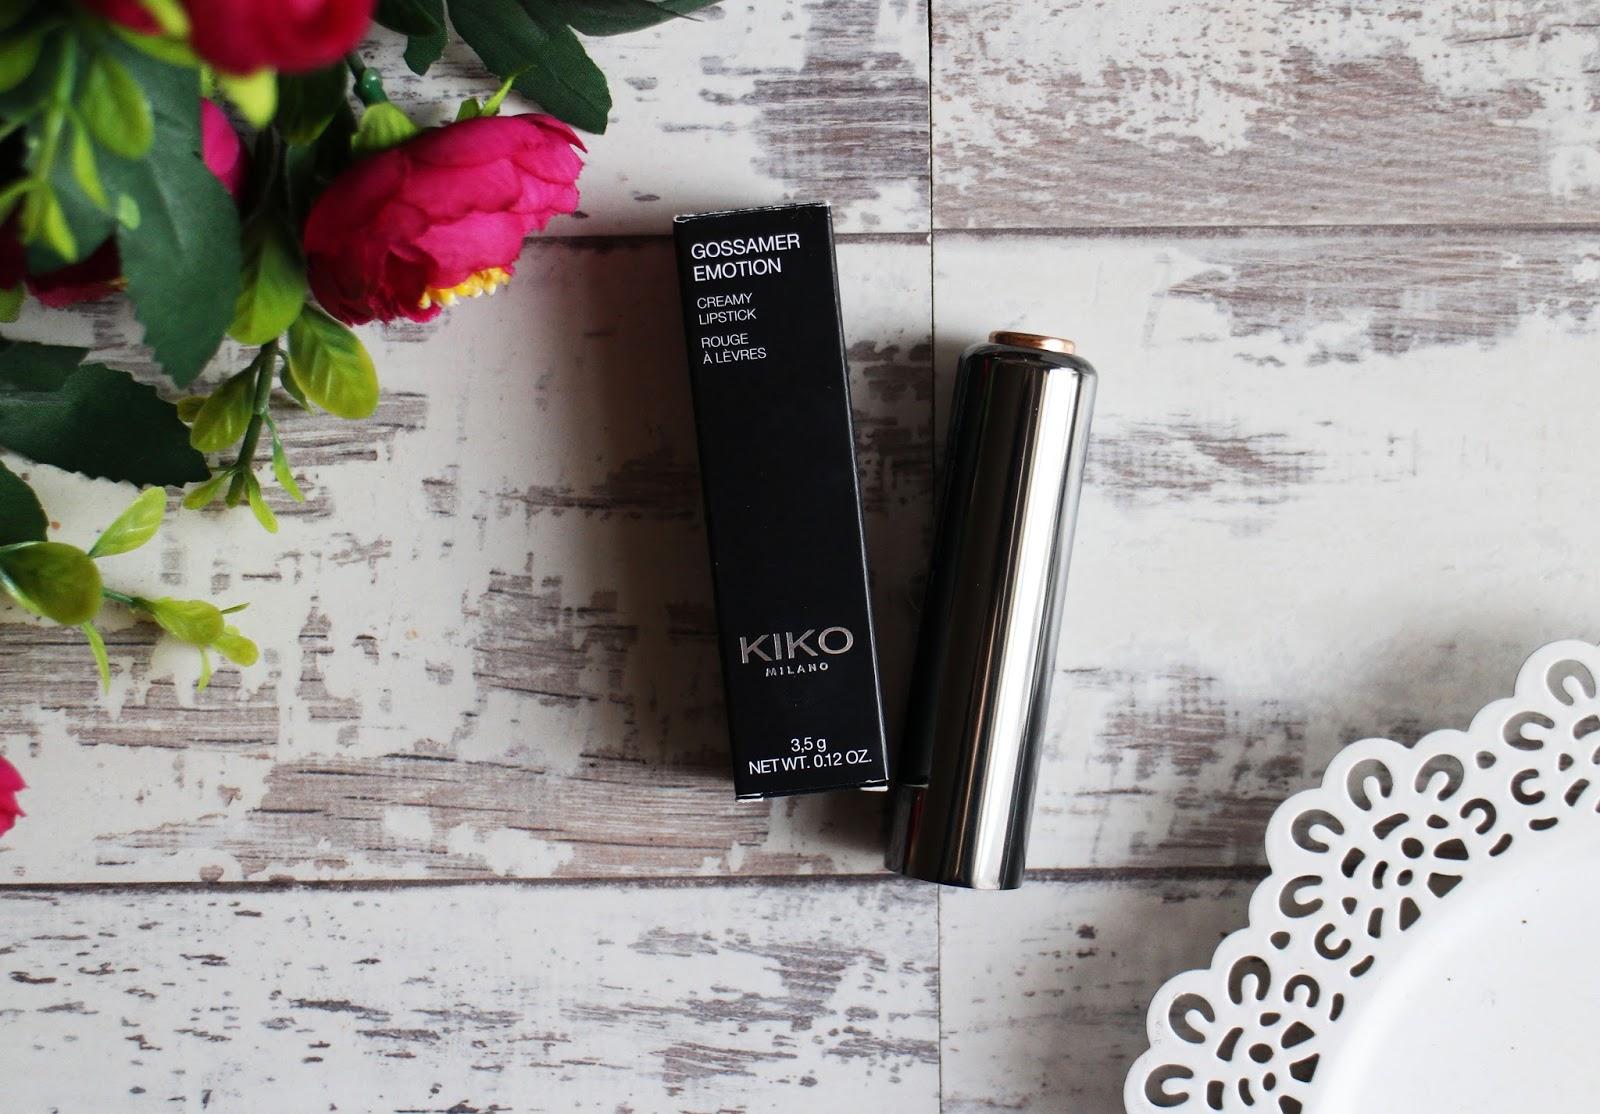 Kiko Gossamer Emotion Creamy Lipstick in 131 Tea Rose